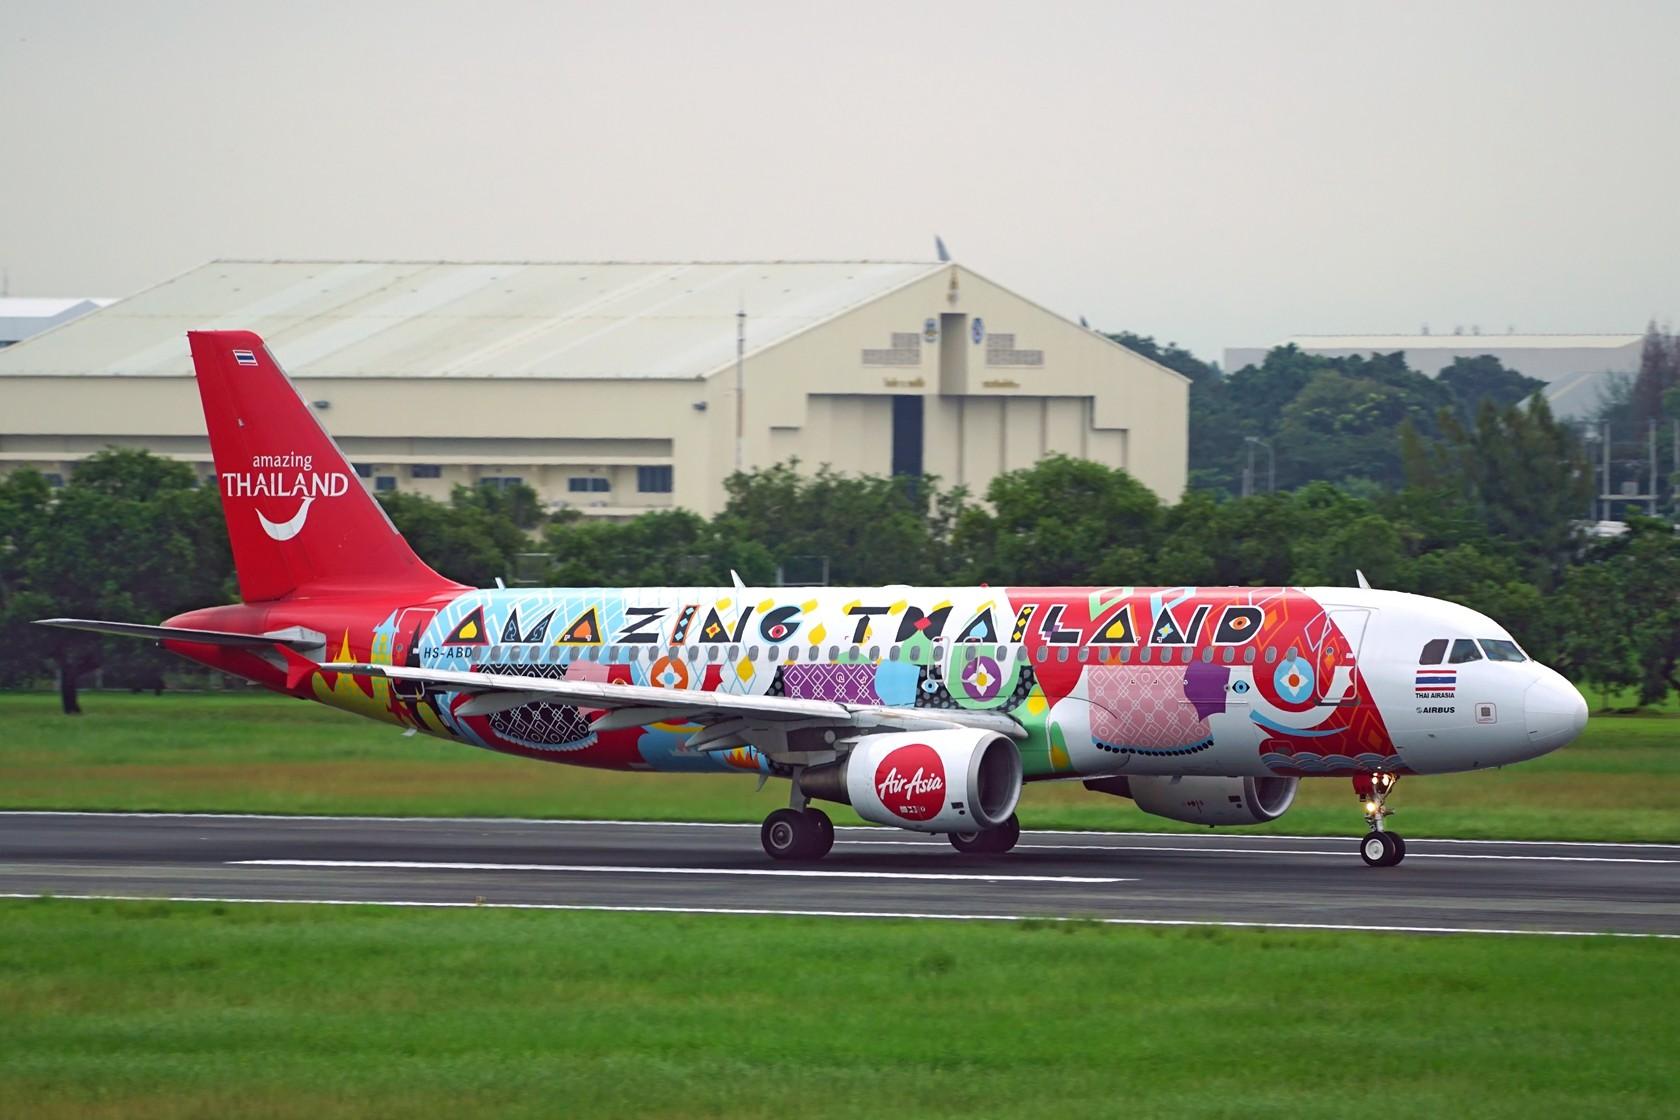 Re:[原创]泰国亚洲航空彩绘 门神+缤纷泰国 AIRBUS A320-200 HS-ABD 泰国曼谷廊曼国际机场